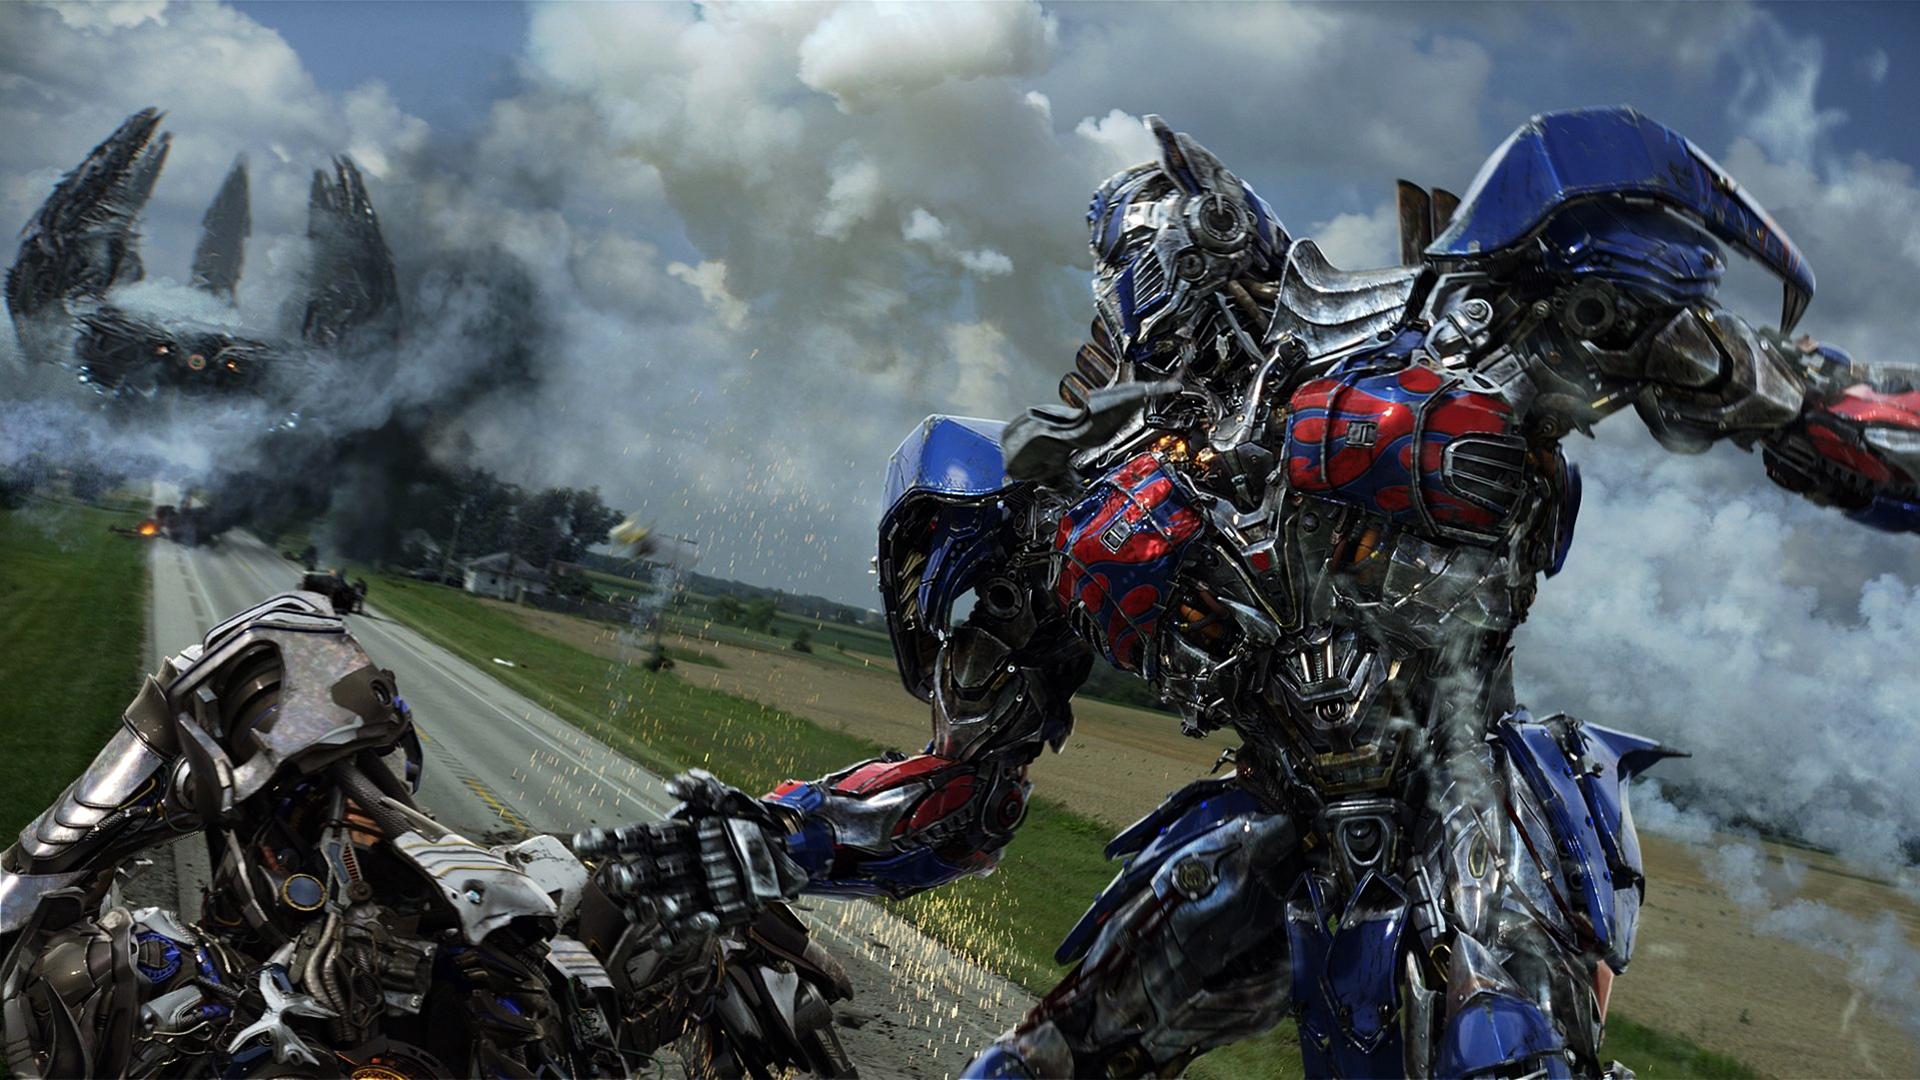 Optimus Prime Wallpapers Hd Wallpapers